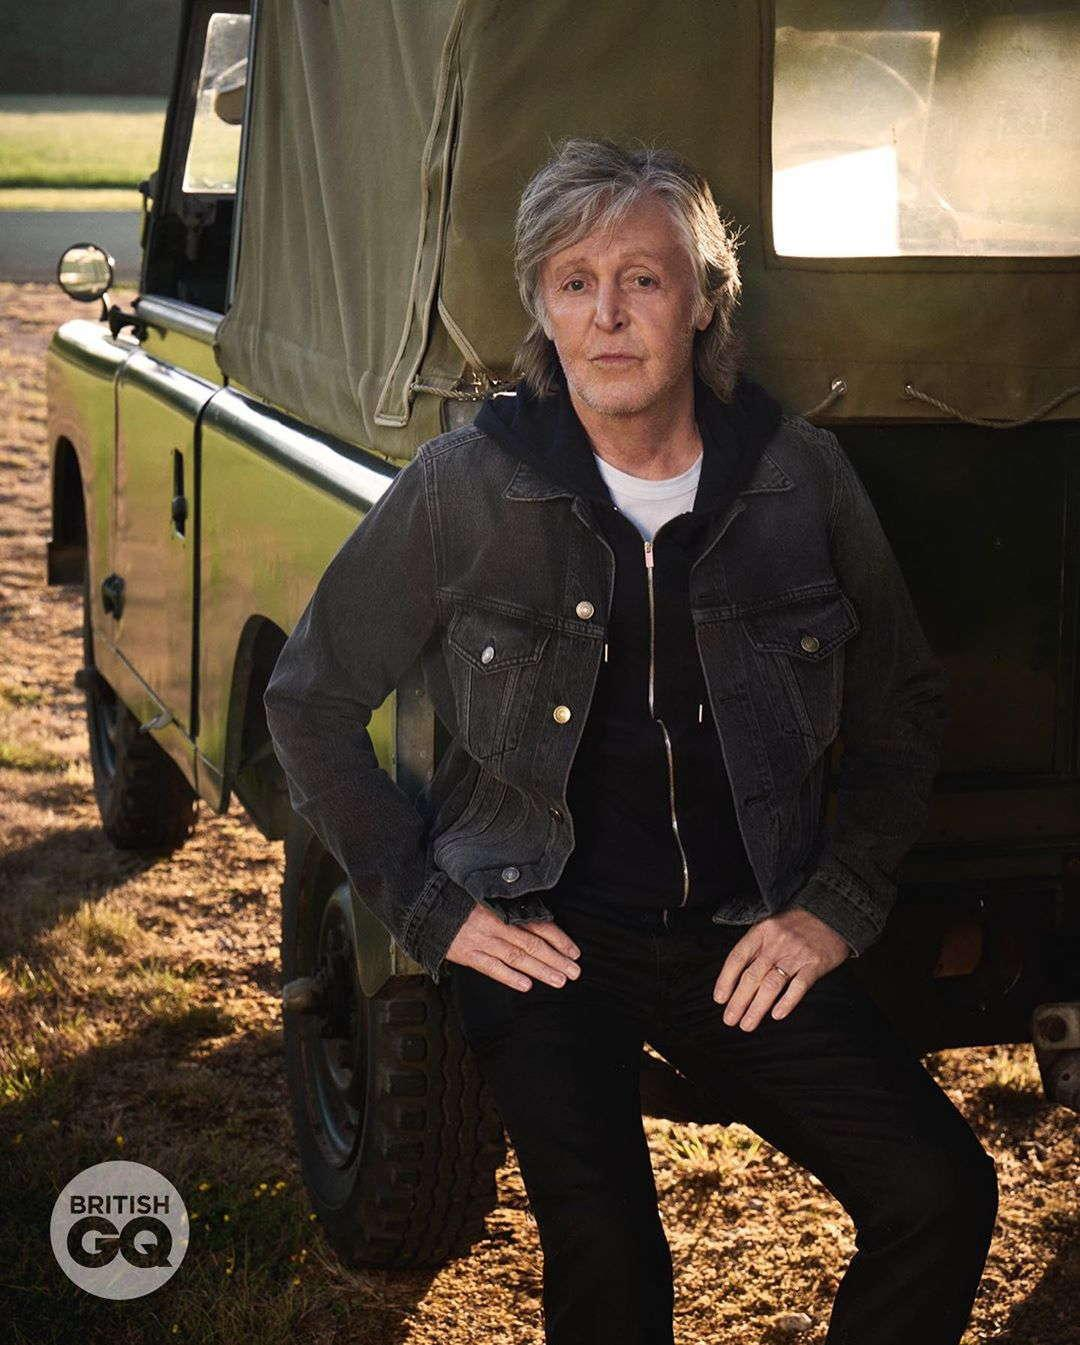 paul-mccartney-covers-british-gq-september-2020-magazine-05